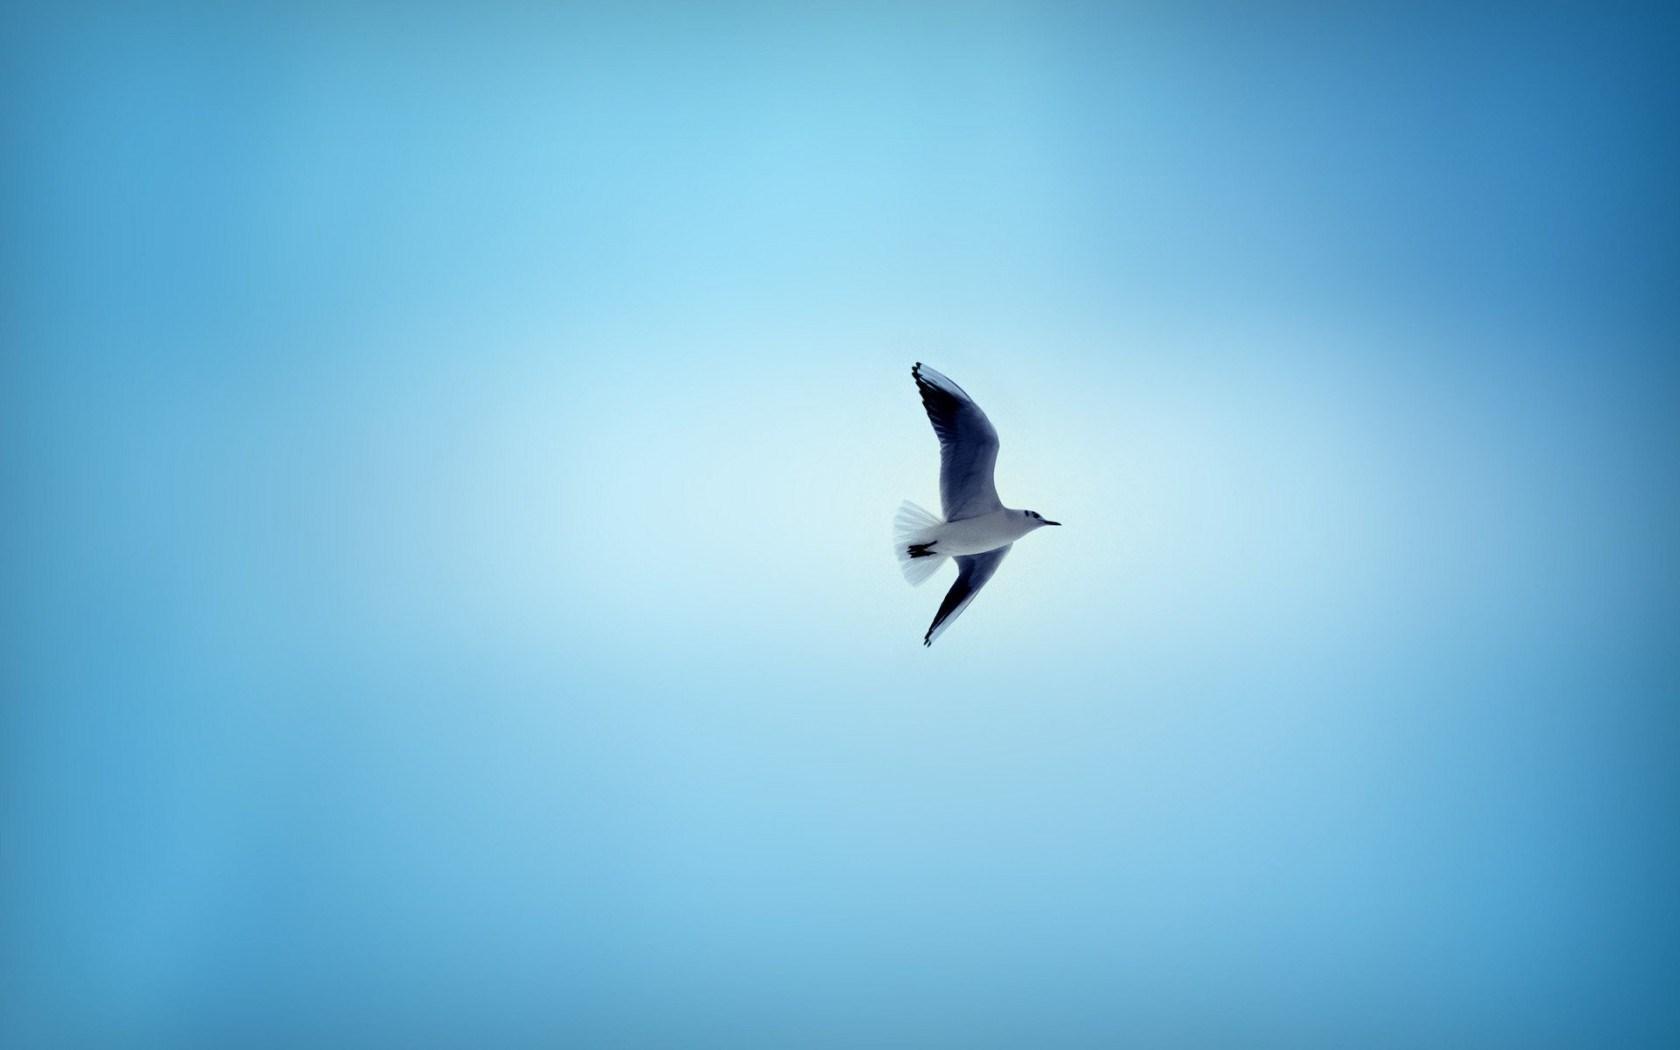 birds sky